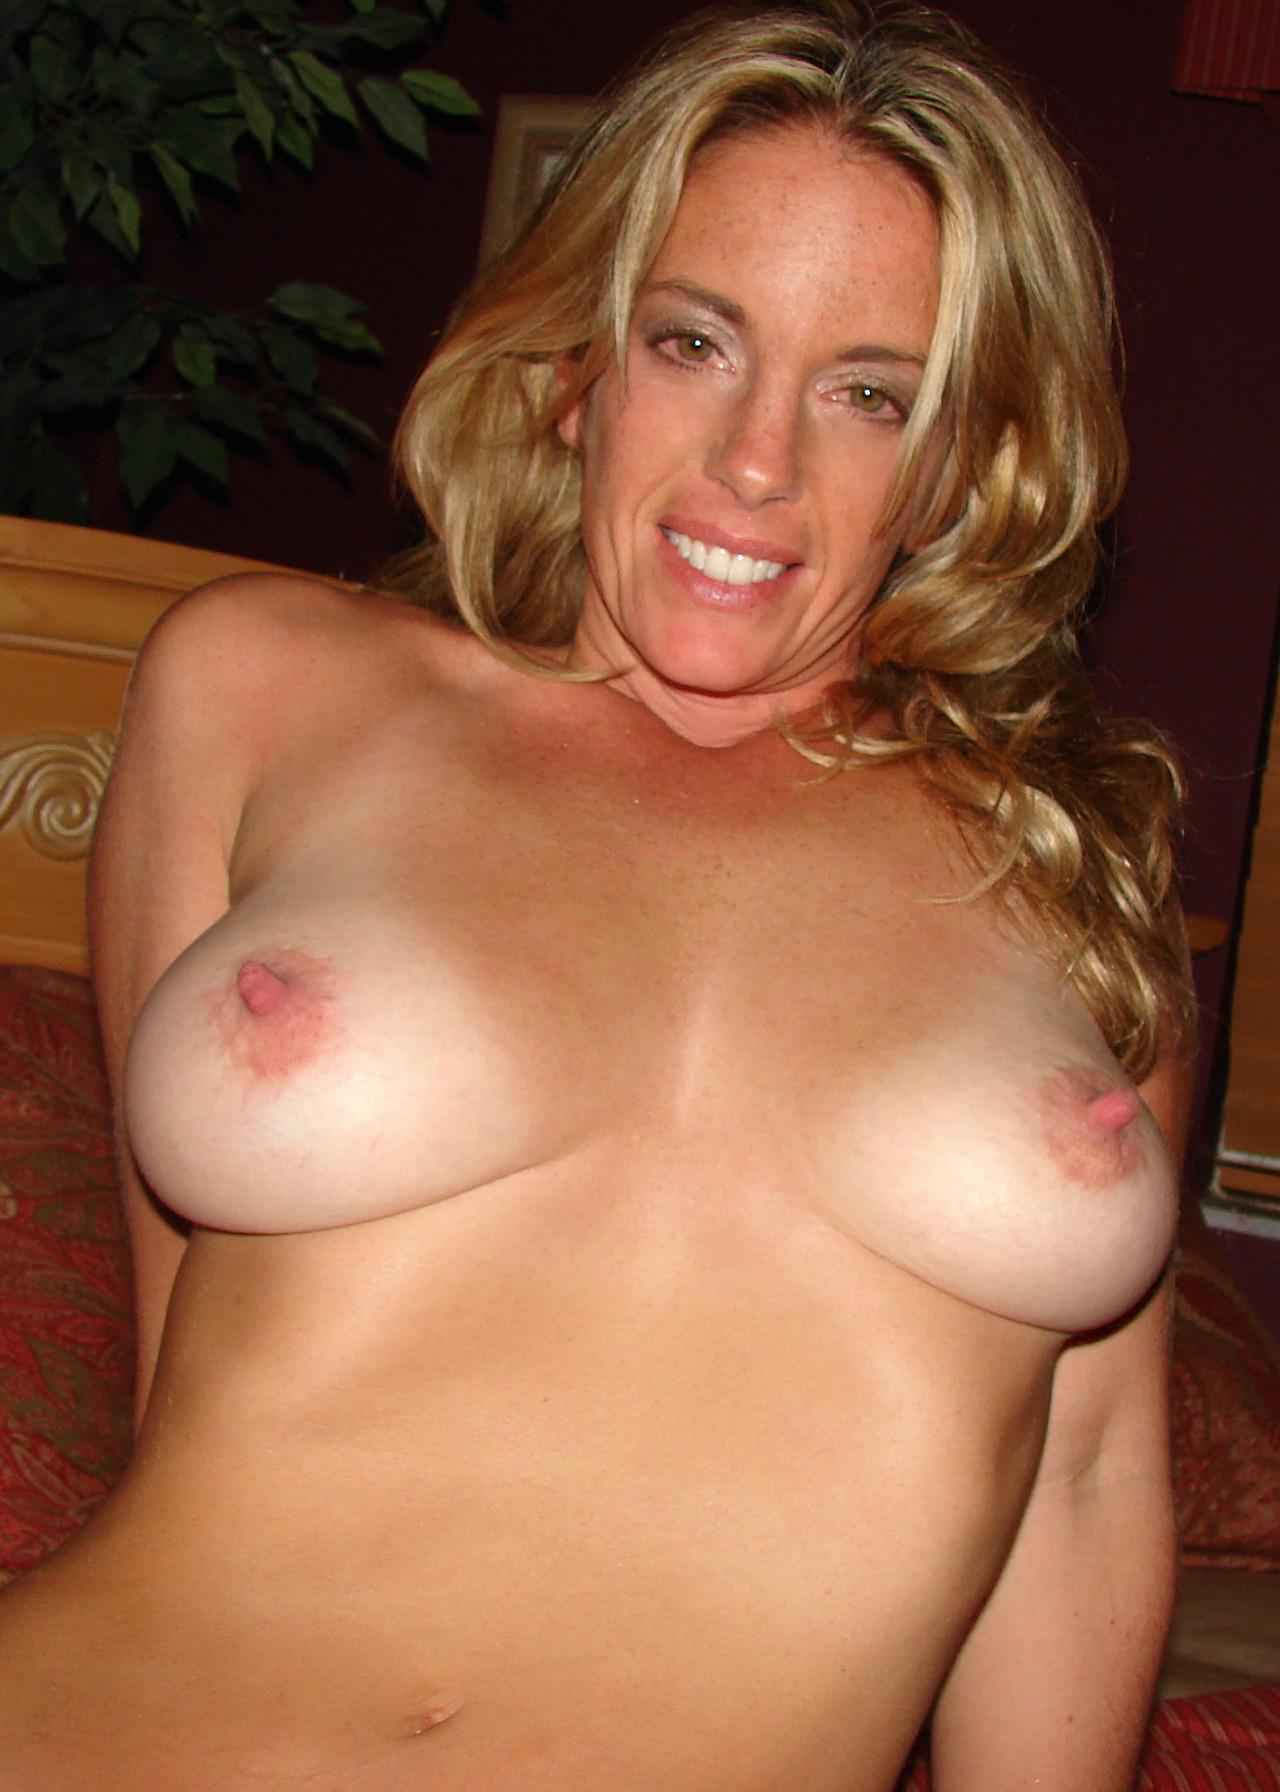 photo porno de fille sexy dans le 32